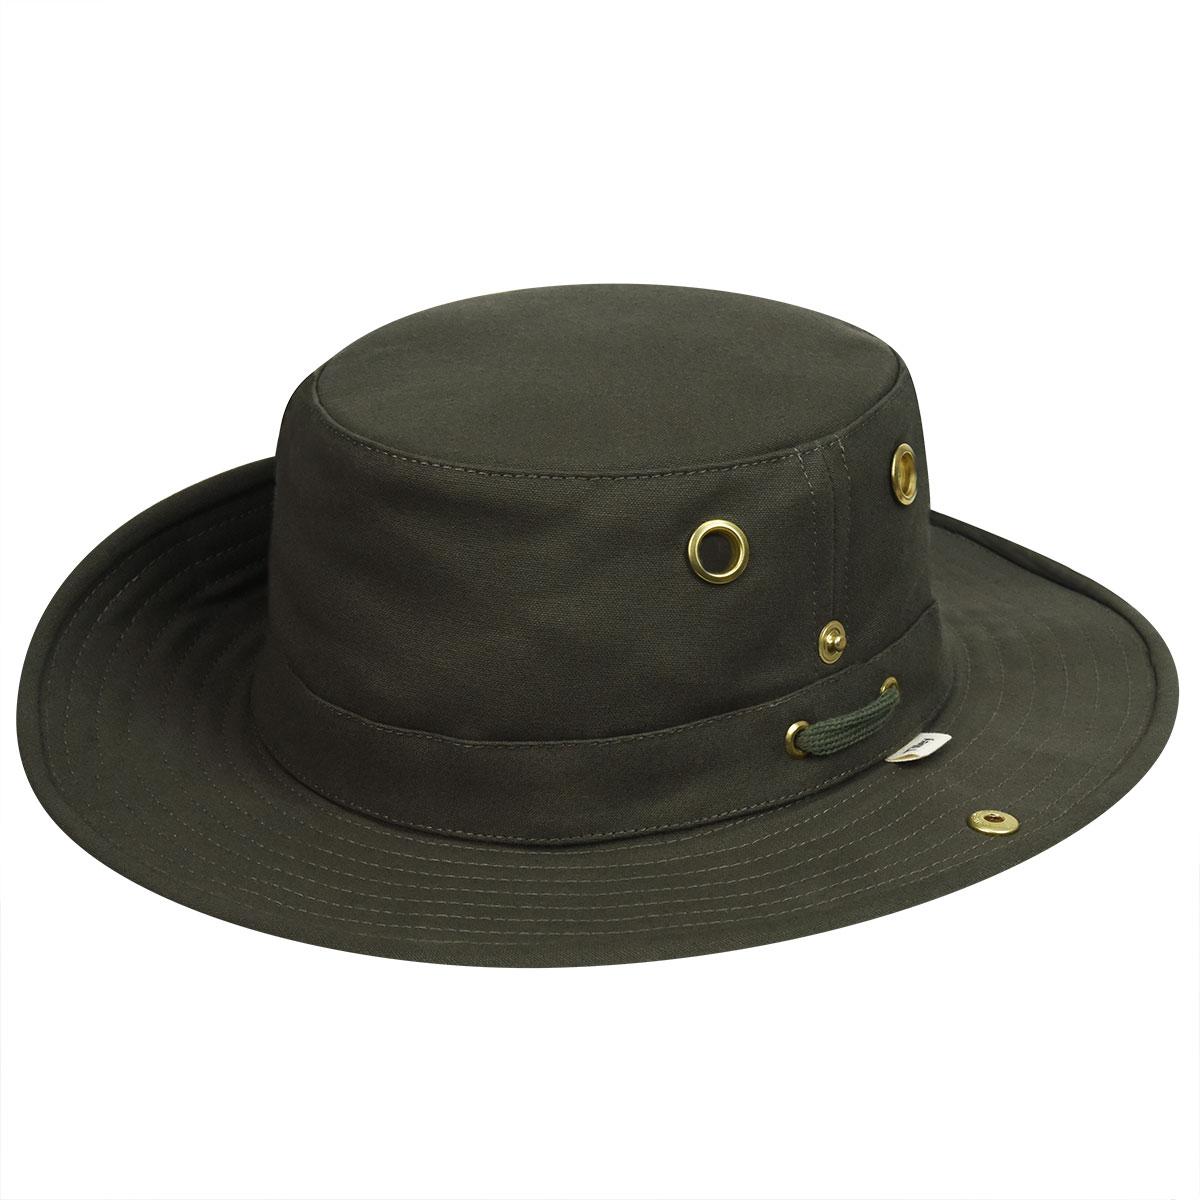 Tilley Cotton Duck Hat - Olive/7 1/8